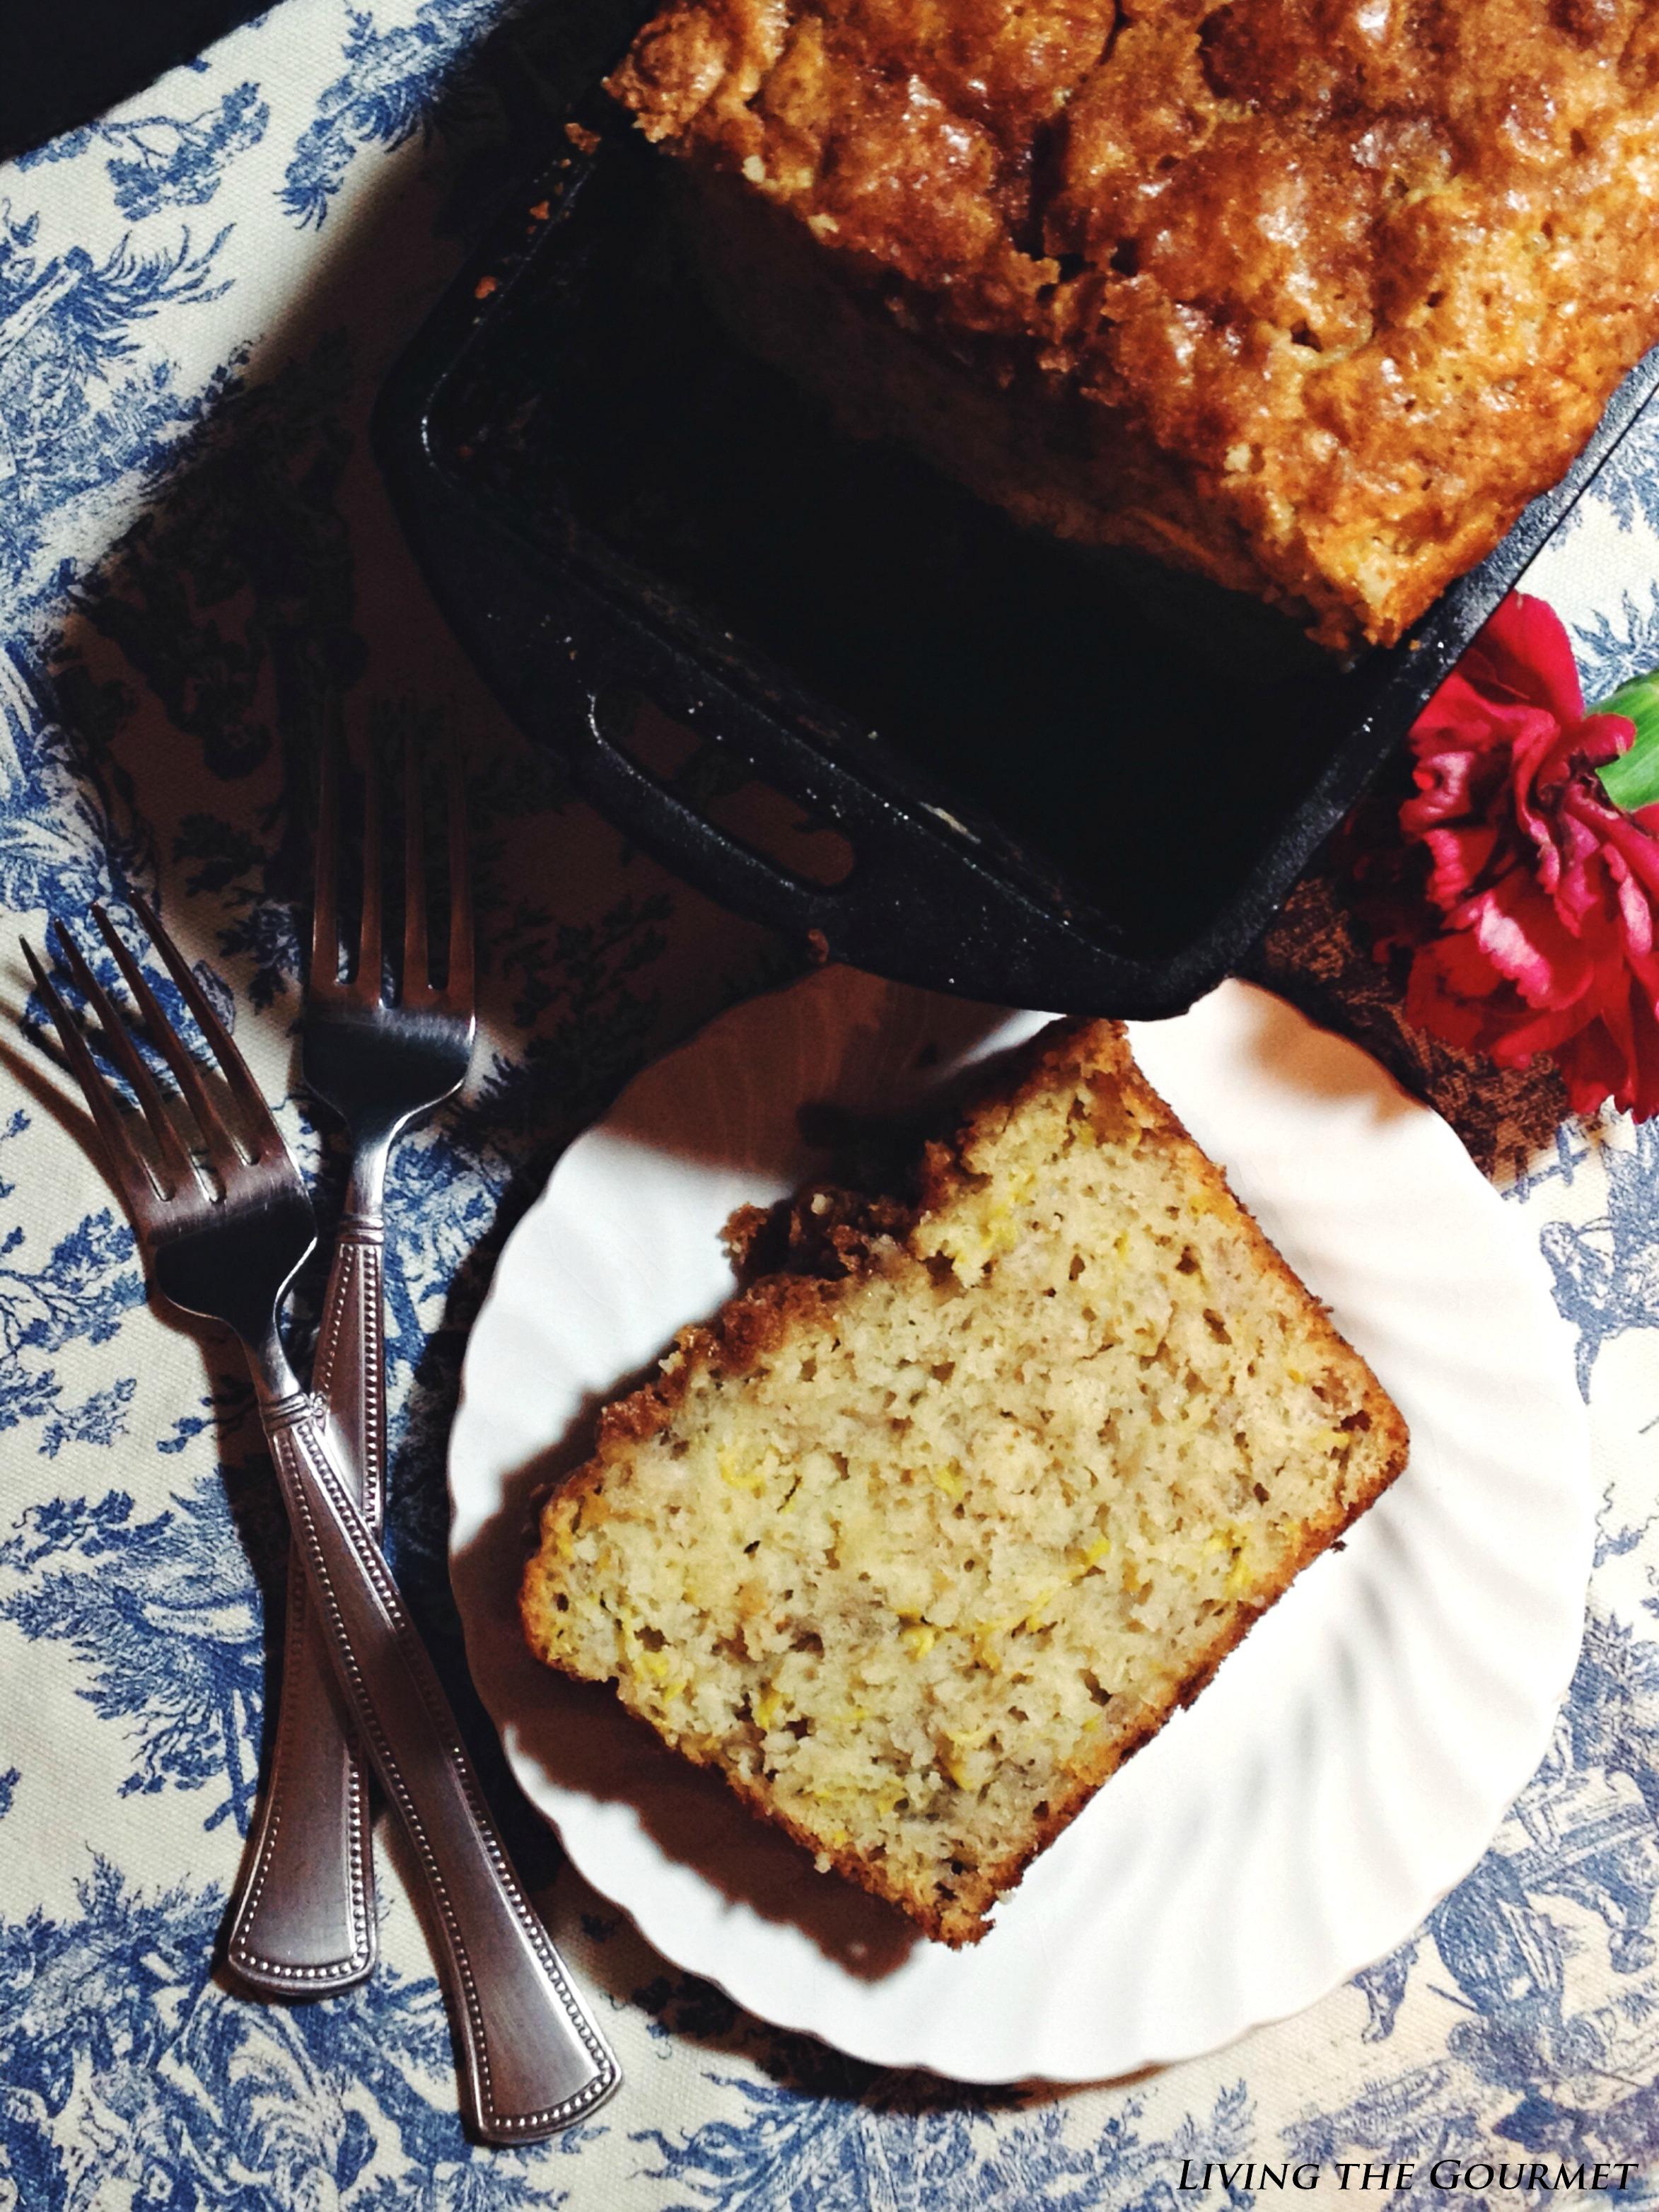 Living the Gourmet: Zucchini, Banana & Apple Breakfast Bread